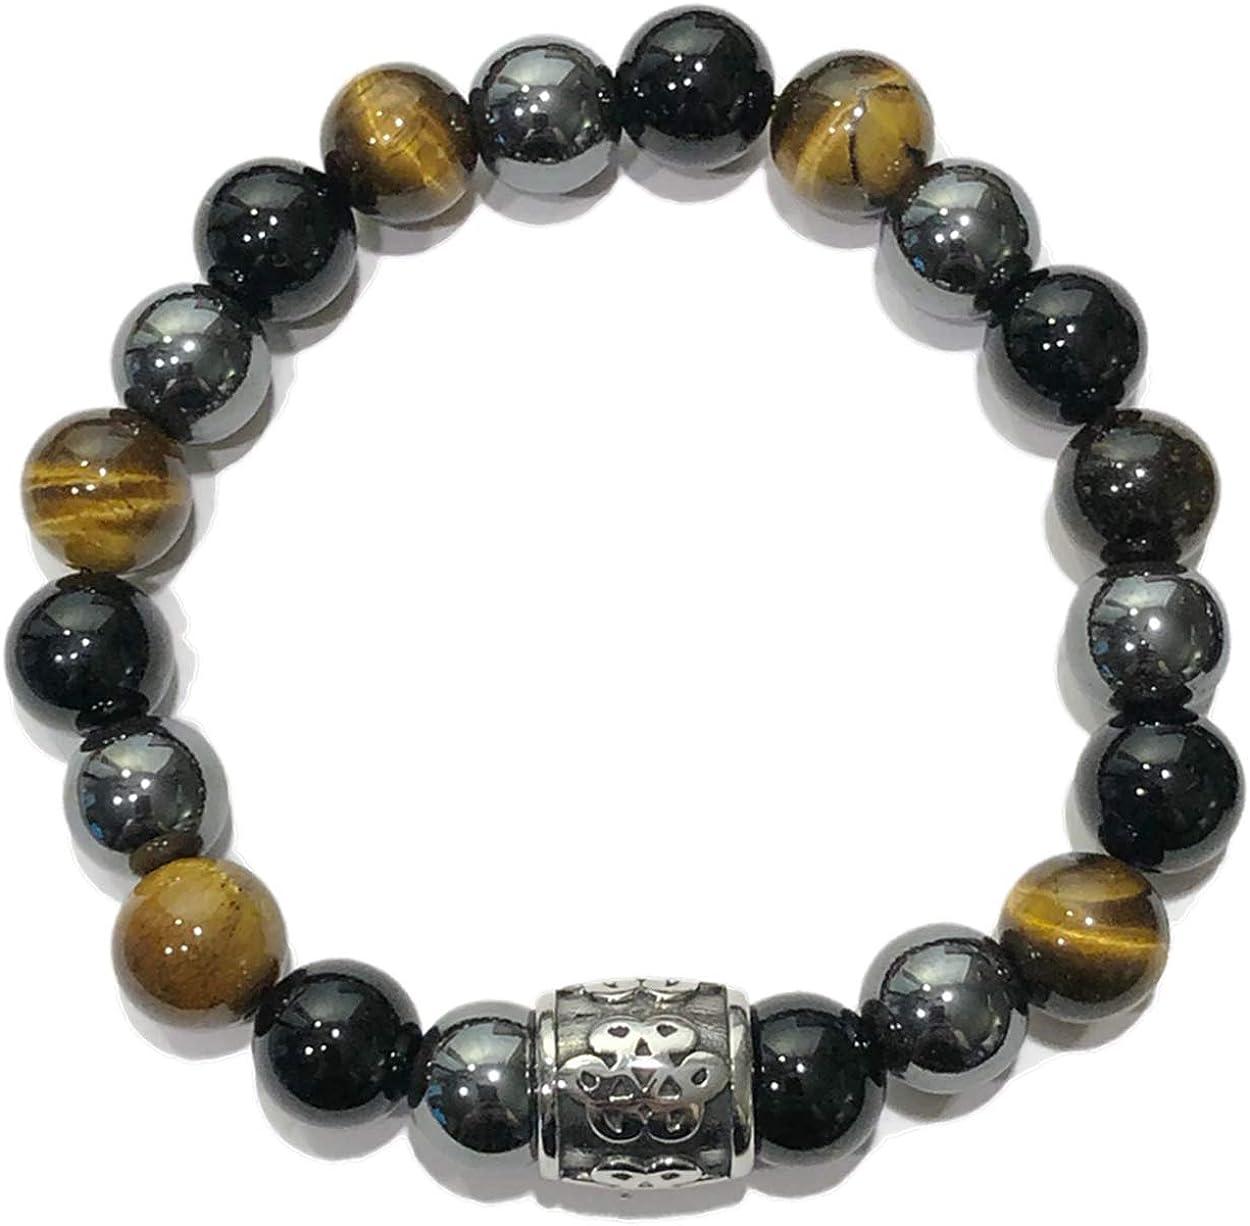 KarmaArm Buddhist | Feng Shui Endless Infinity Knot Bracelet | Happy Life | Meditation Self-Care Wellness Wristband Yoga Mala Jewelry | Black Onyx | Tiger Eye | Hematite